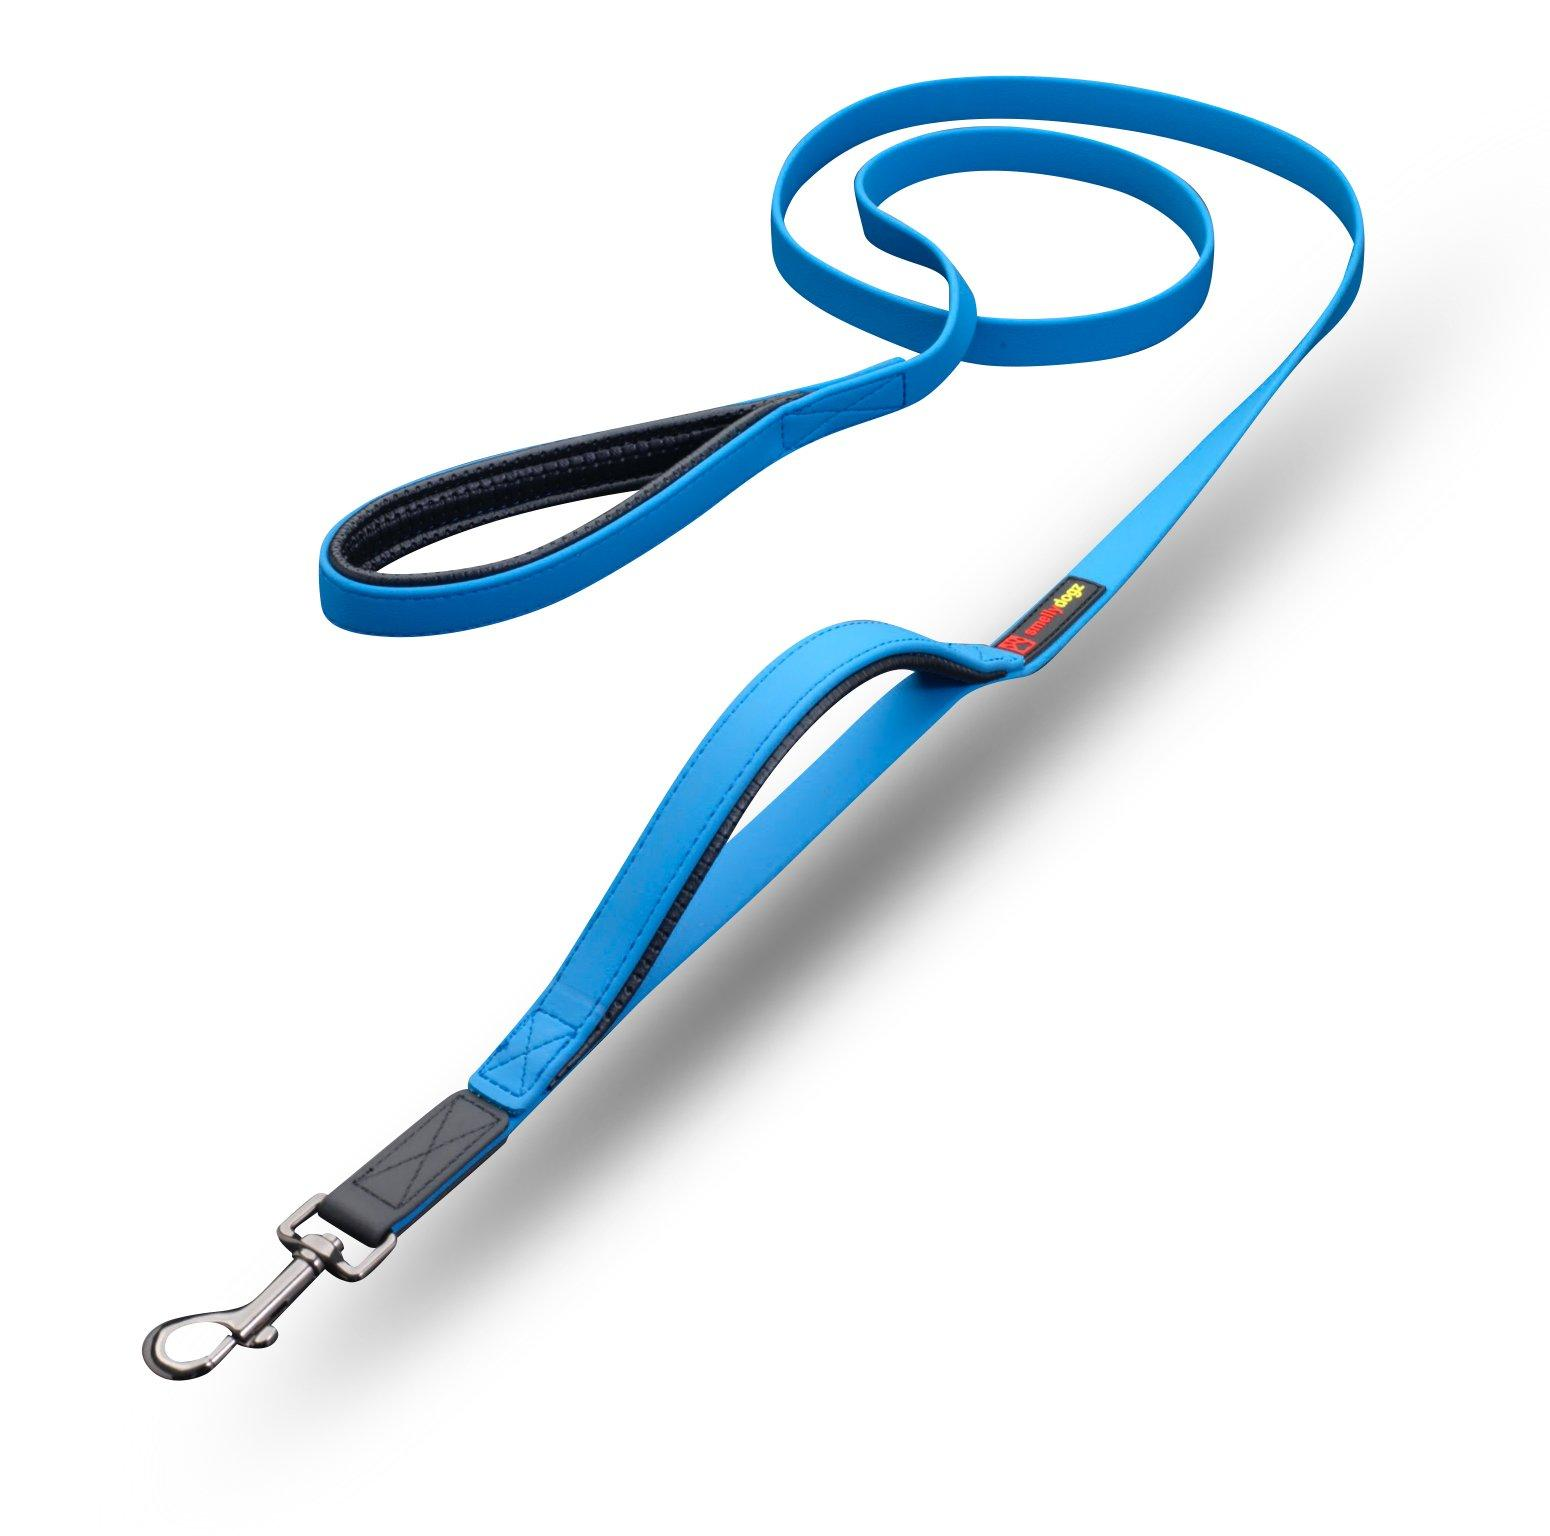 smellydogz Double Handle Dog Lead, Blue Image